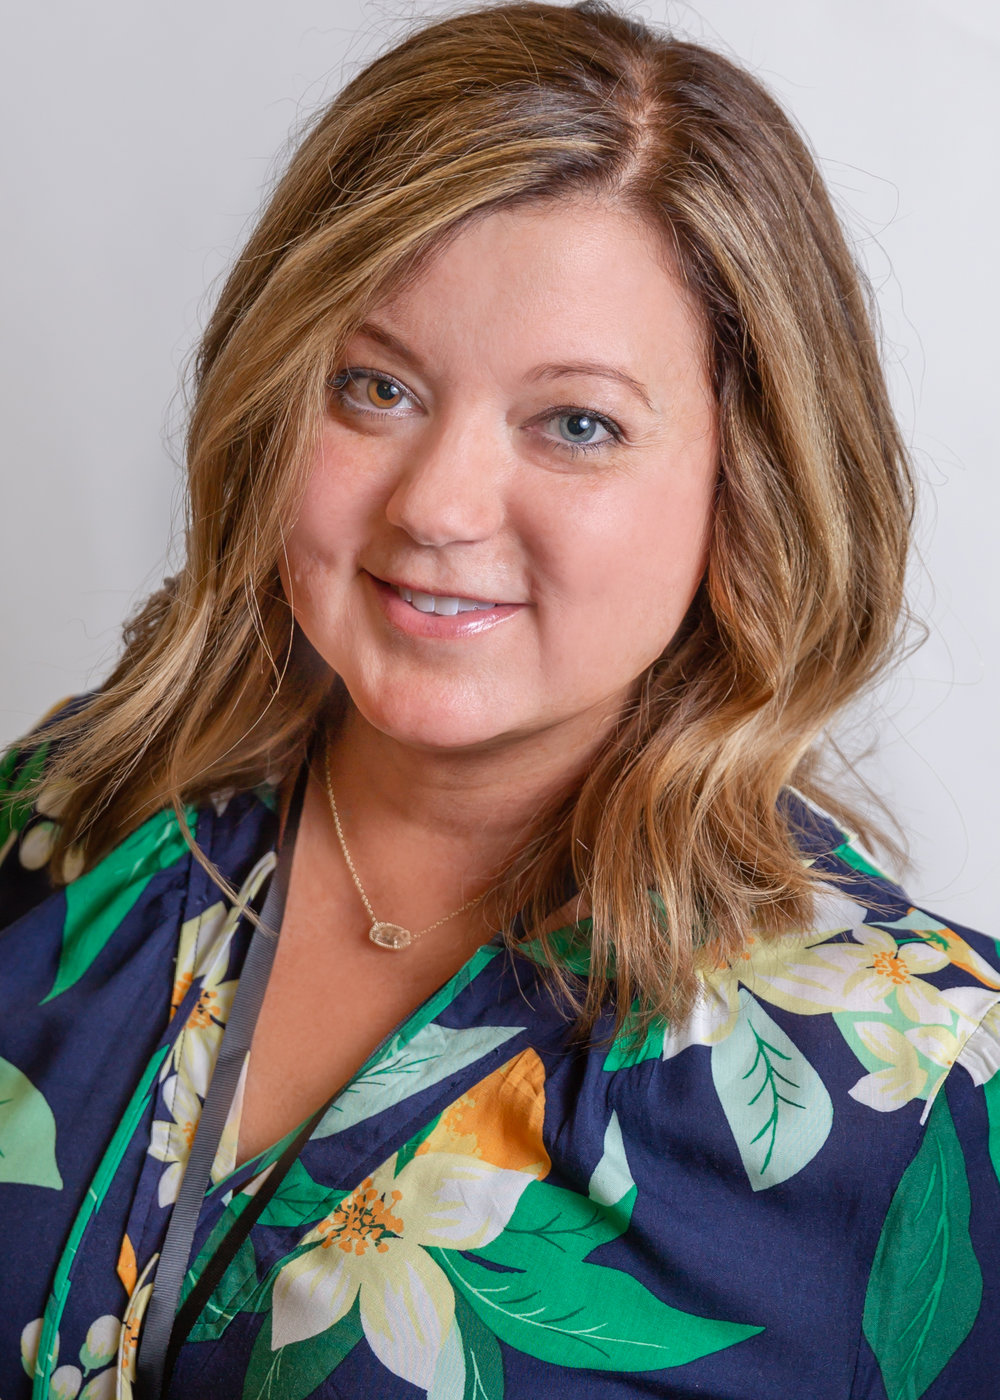 Jen Klump | Official Photography On staff since 2016